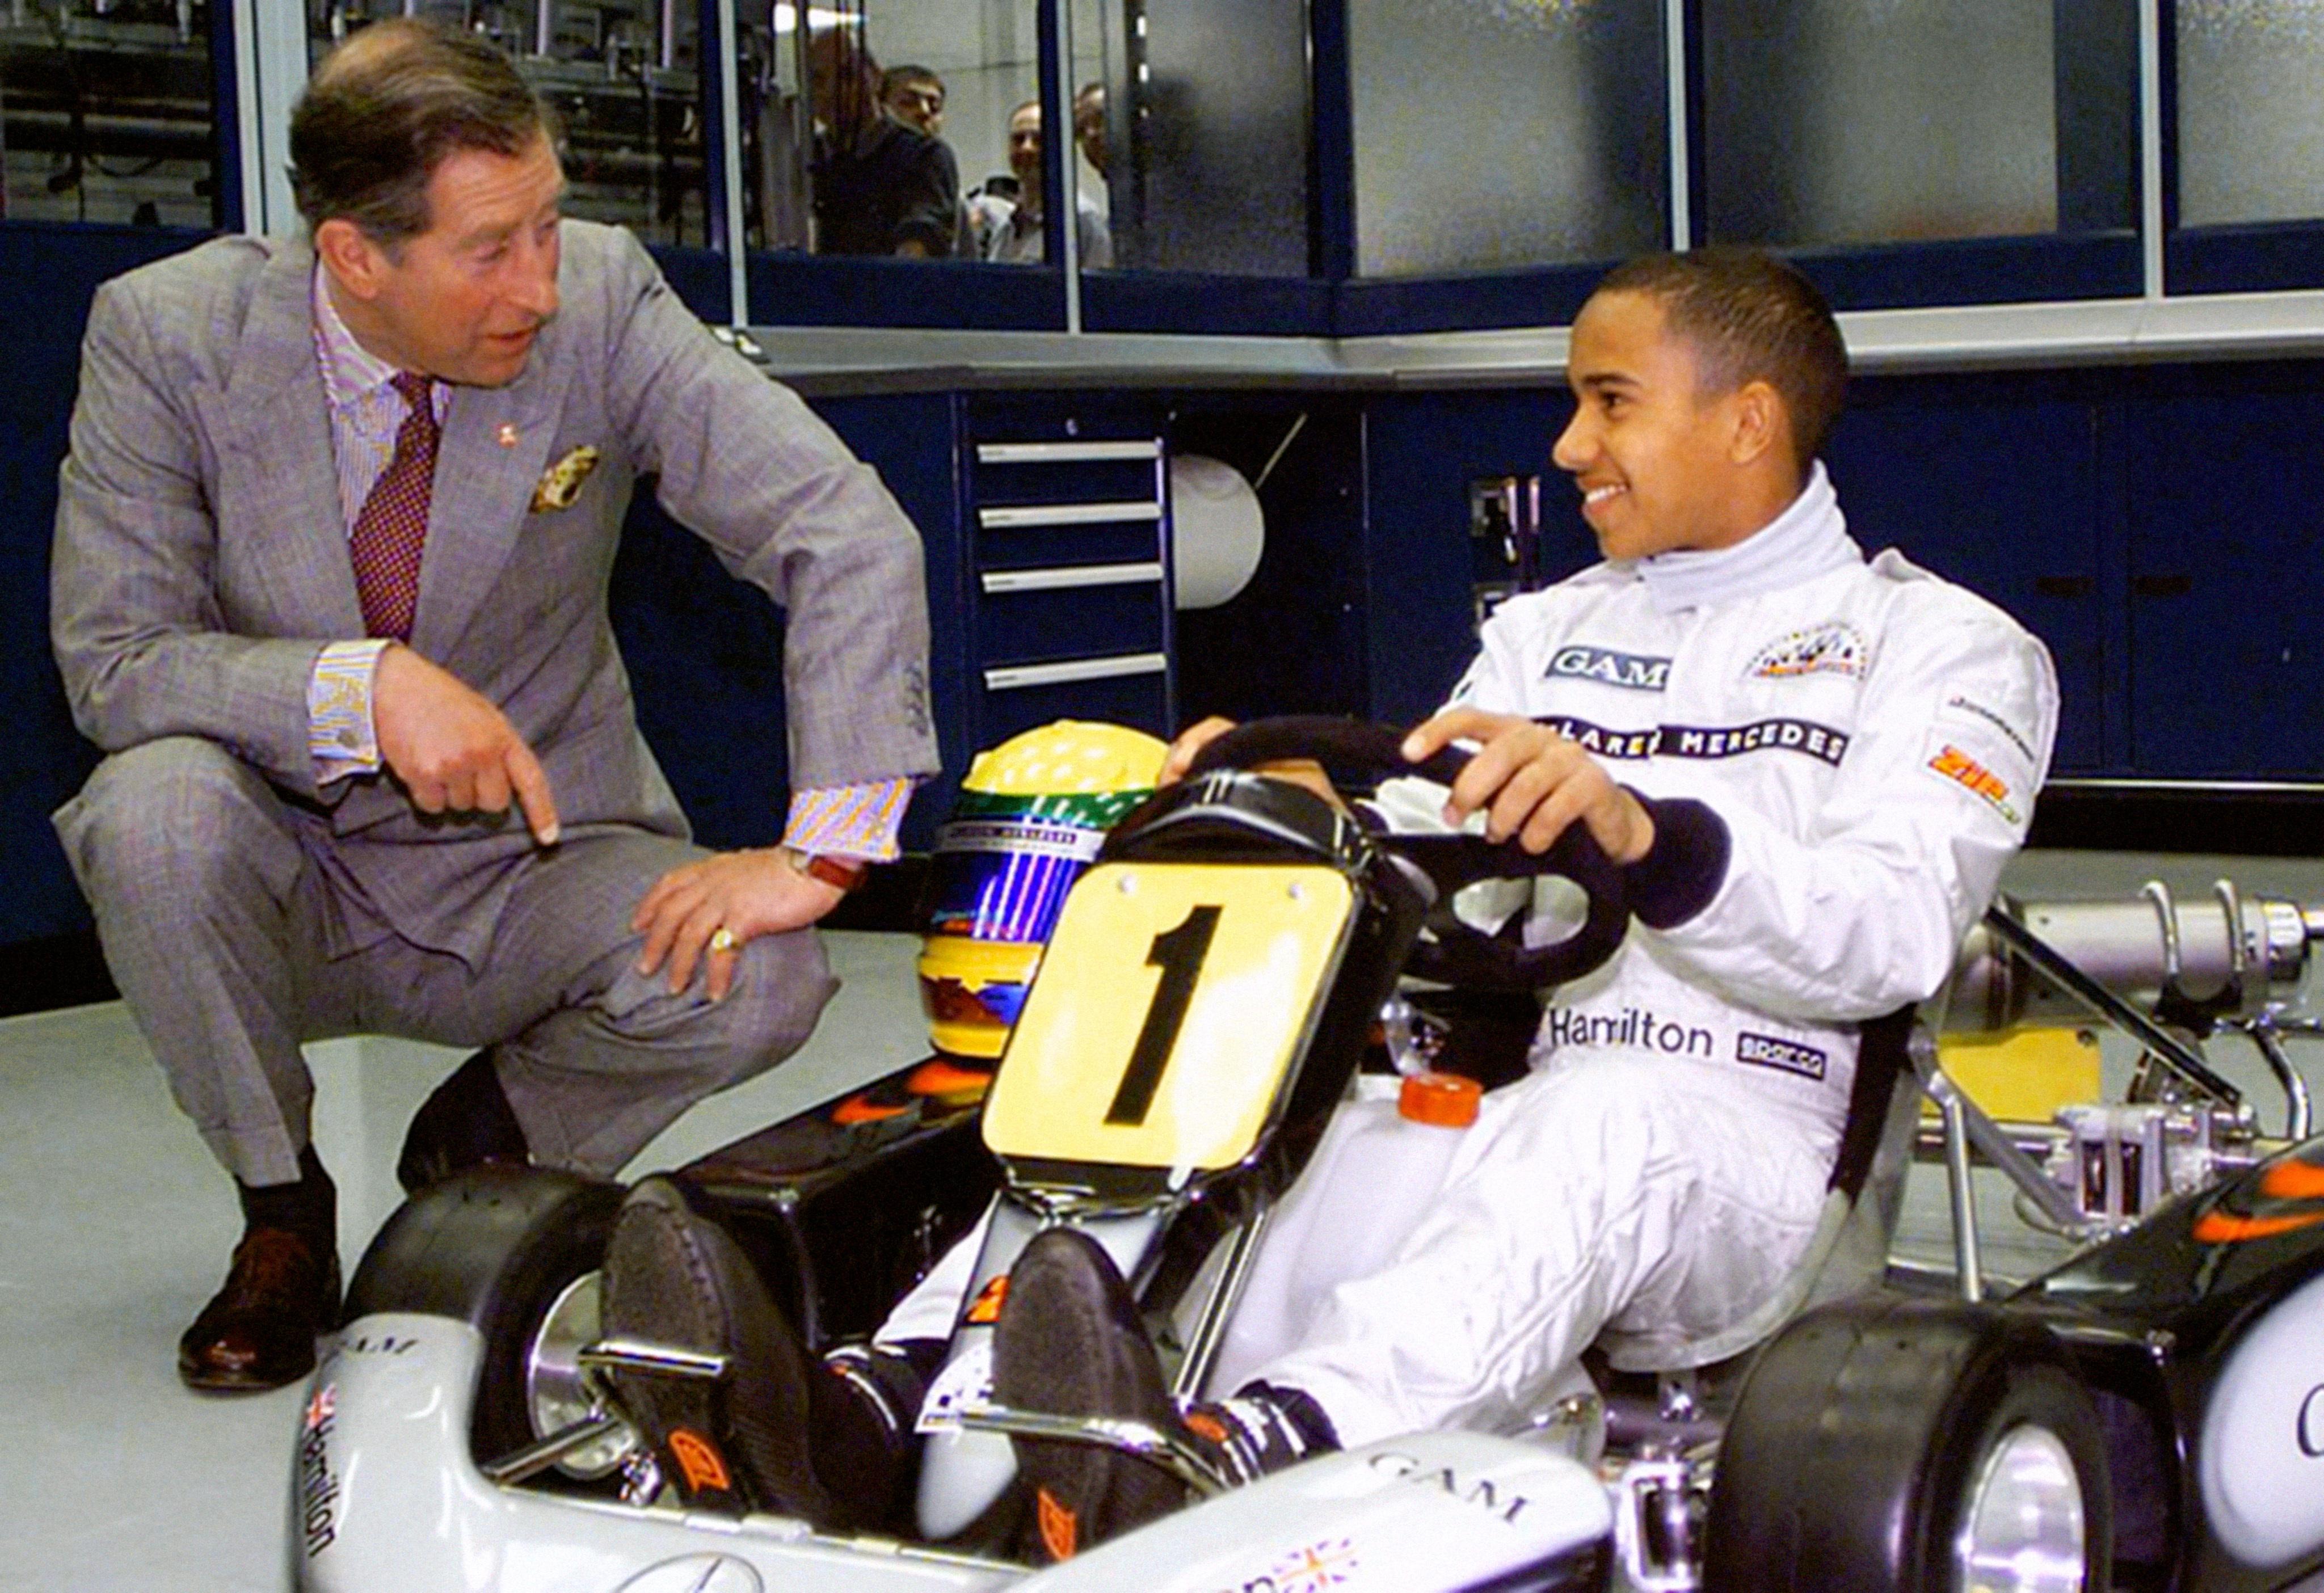 Lewis Hamilton and Prince Charles